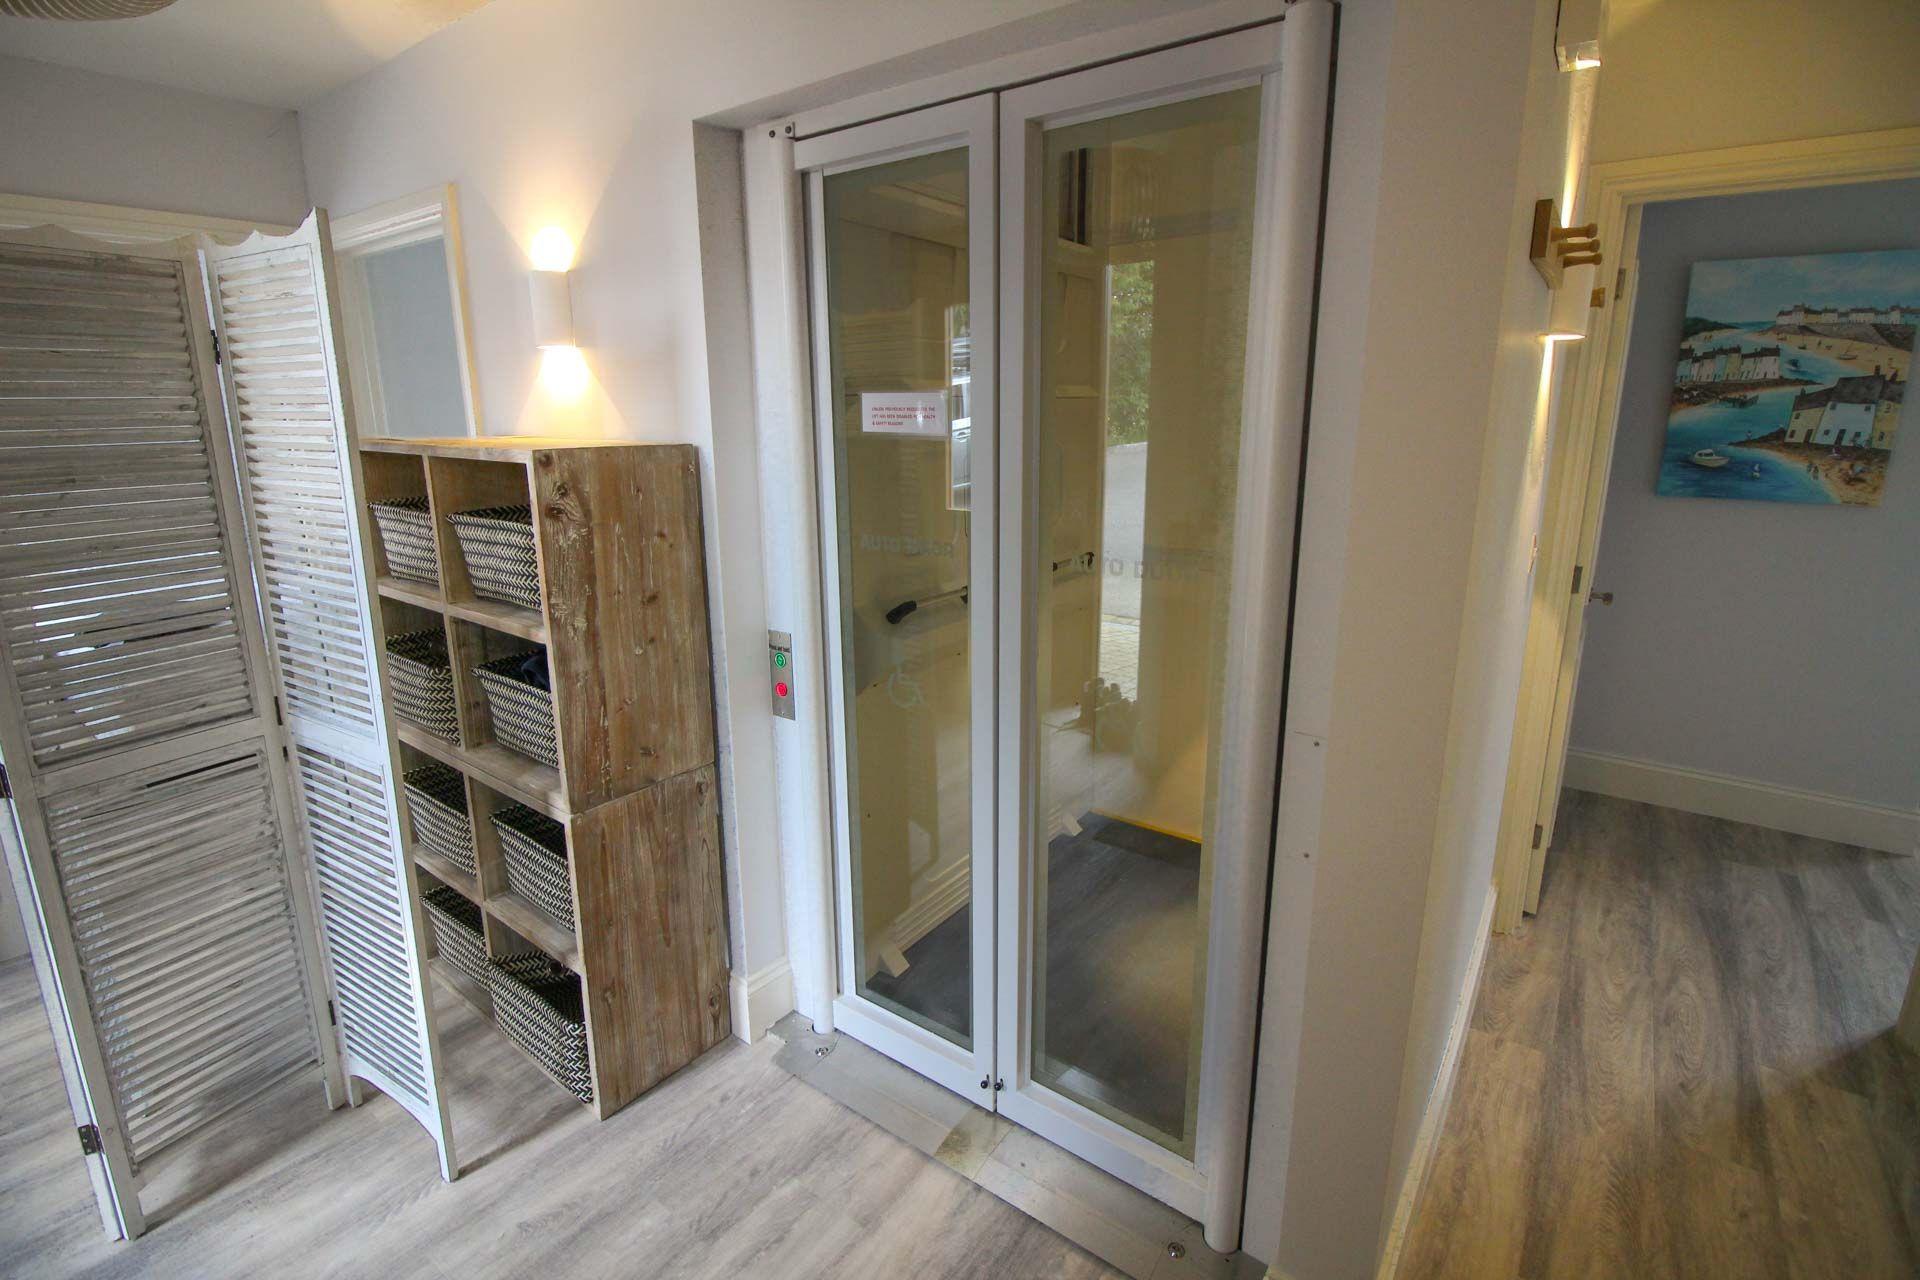 wc hardwood floors inc of large luxury holiday home st mawes sea views balcony gardens regarding 3859948